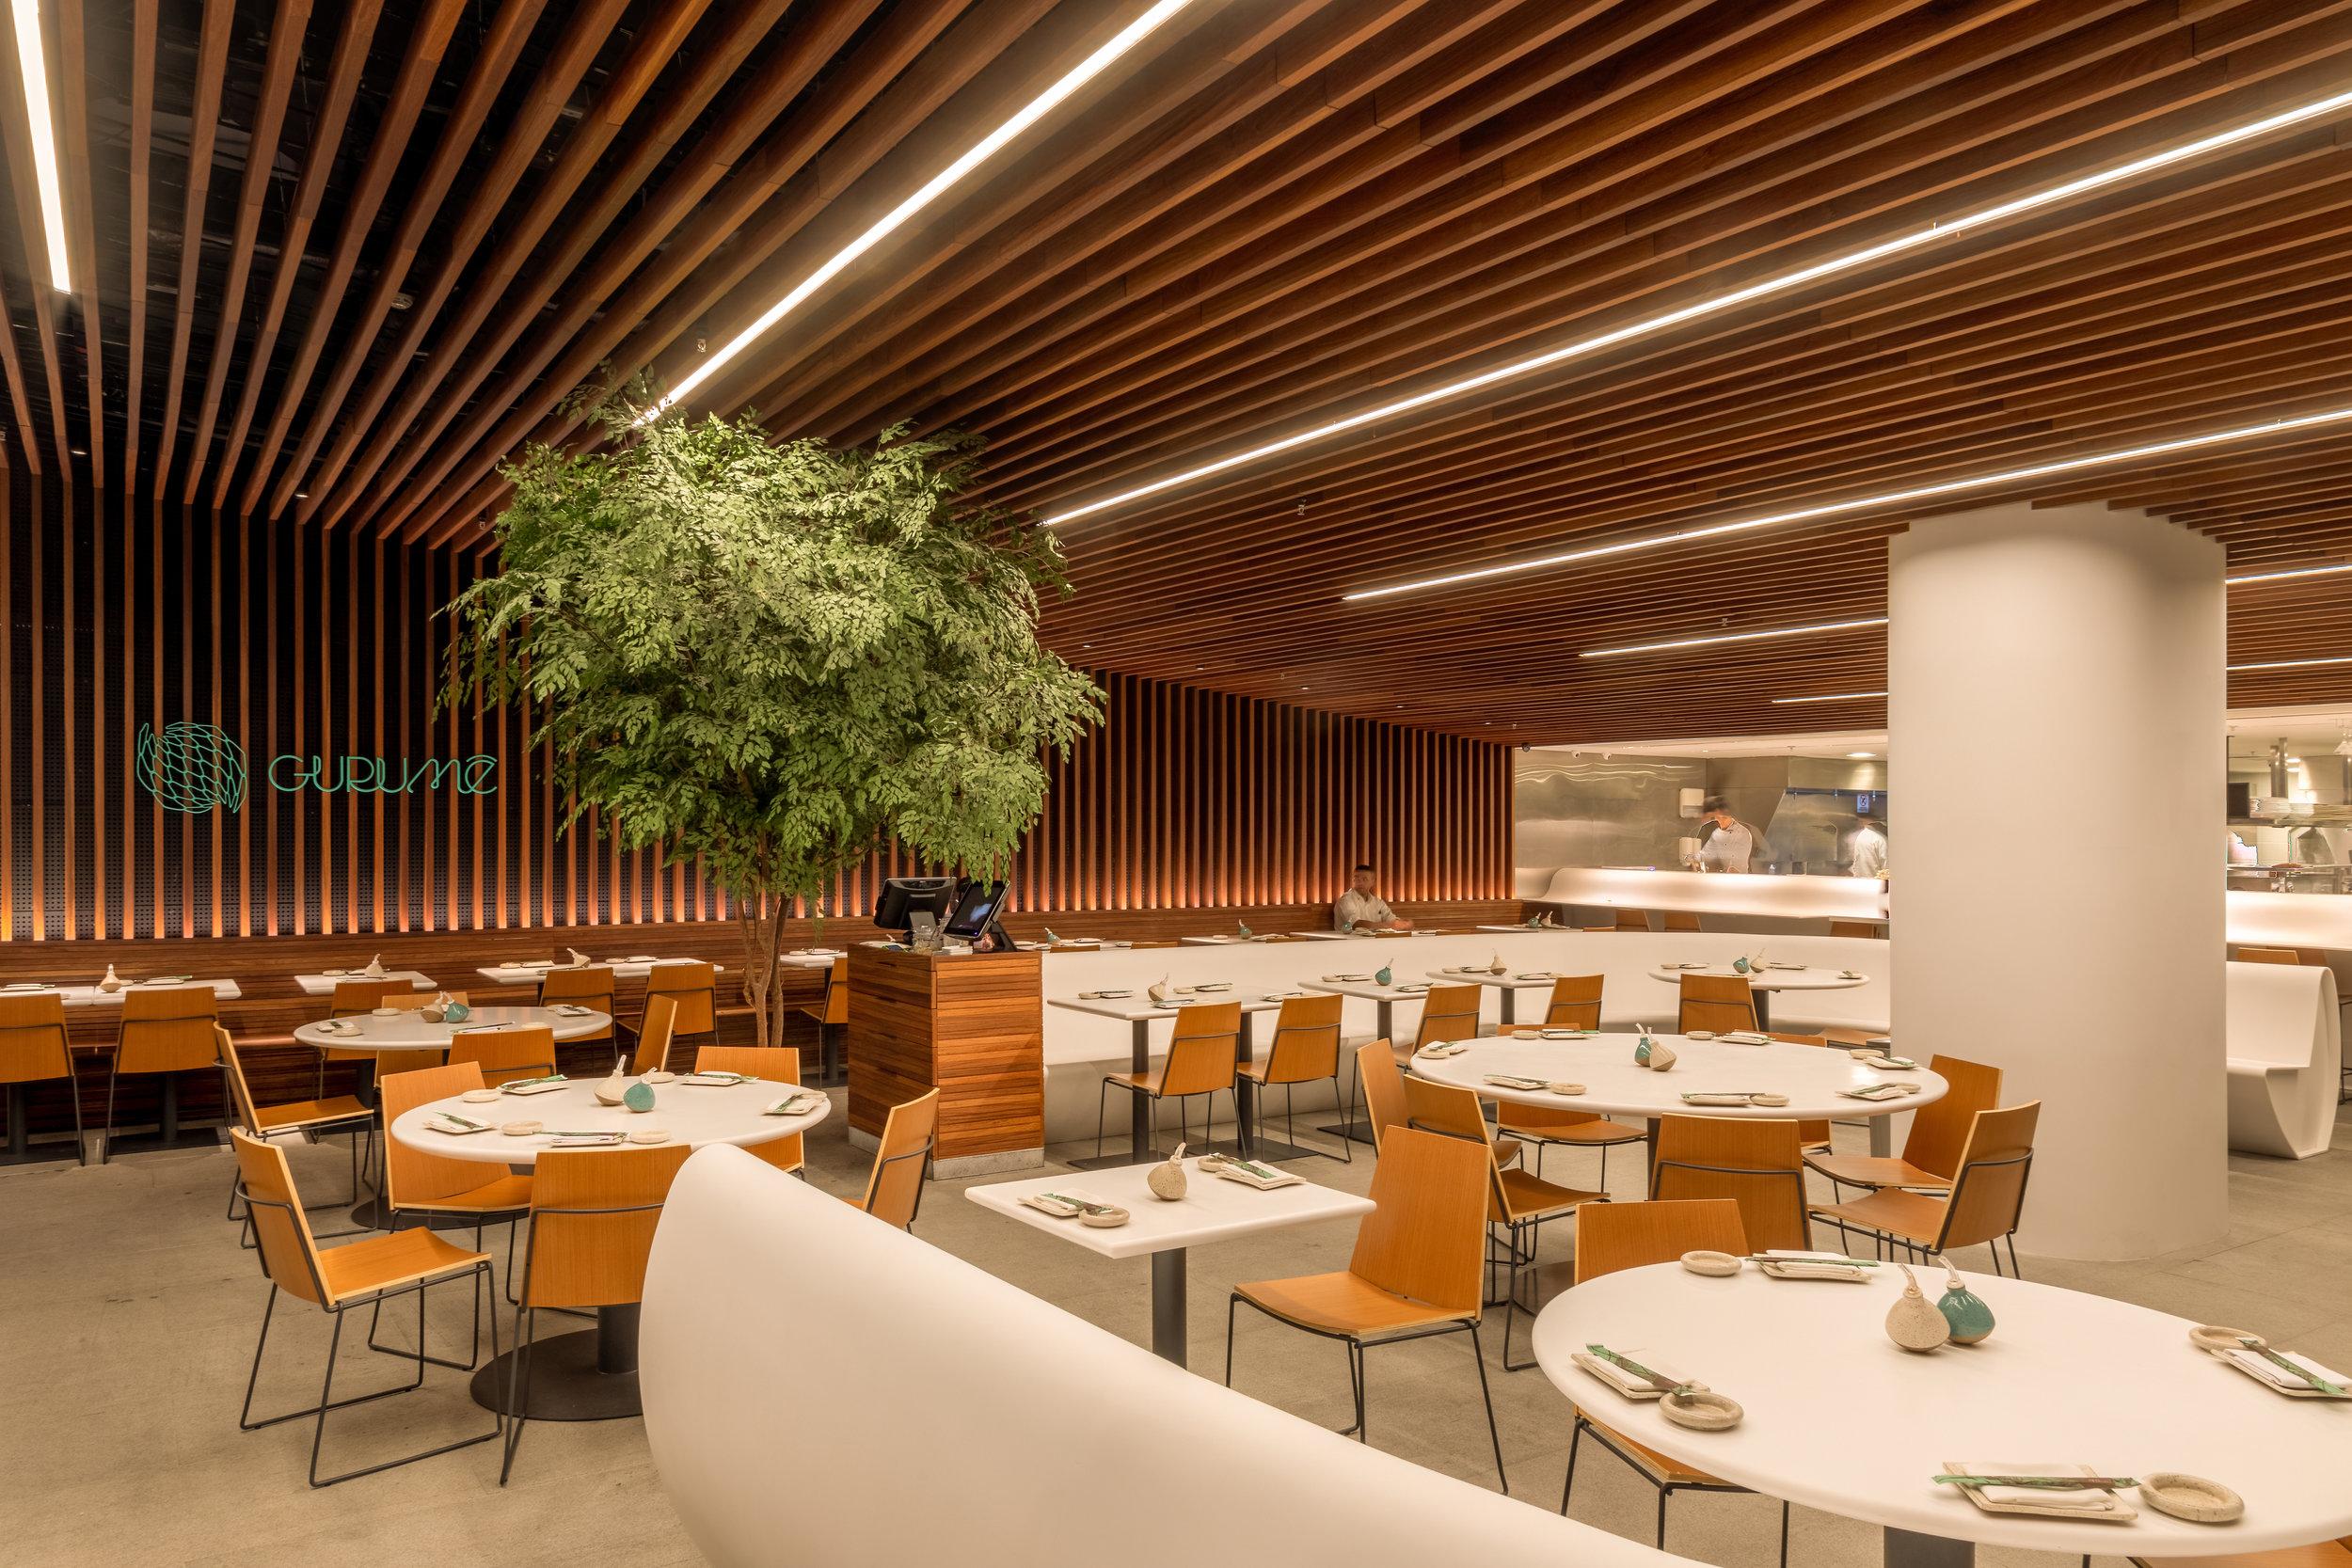 LIGHTSOURCE_Restaurante-Gurume-2019_Bernardes-Arquitetura_Studio-iluz_012.jpg